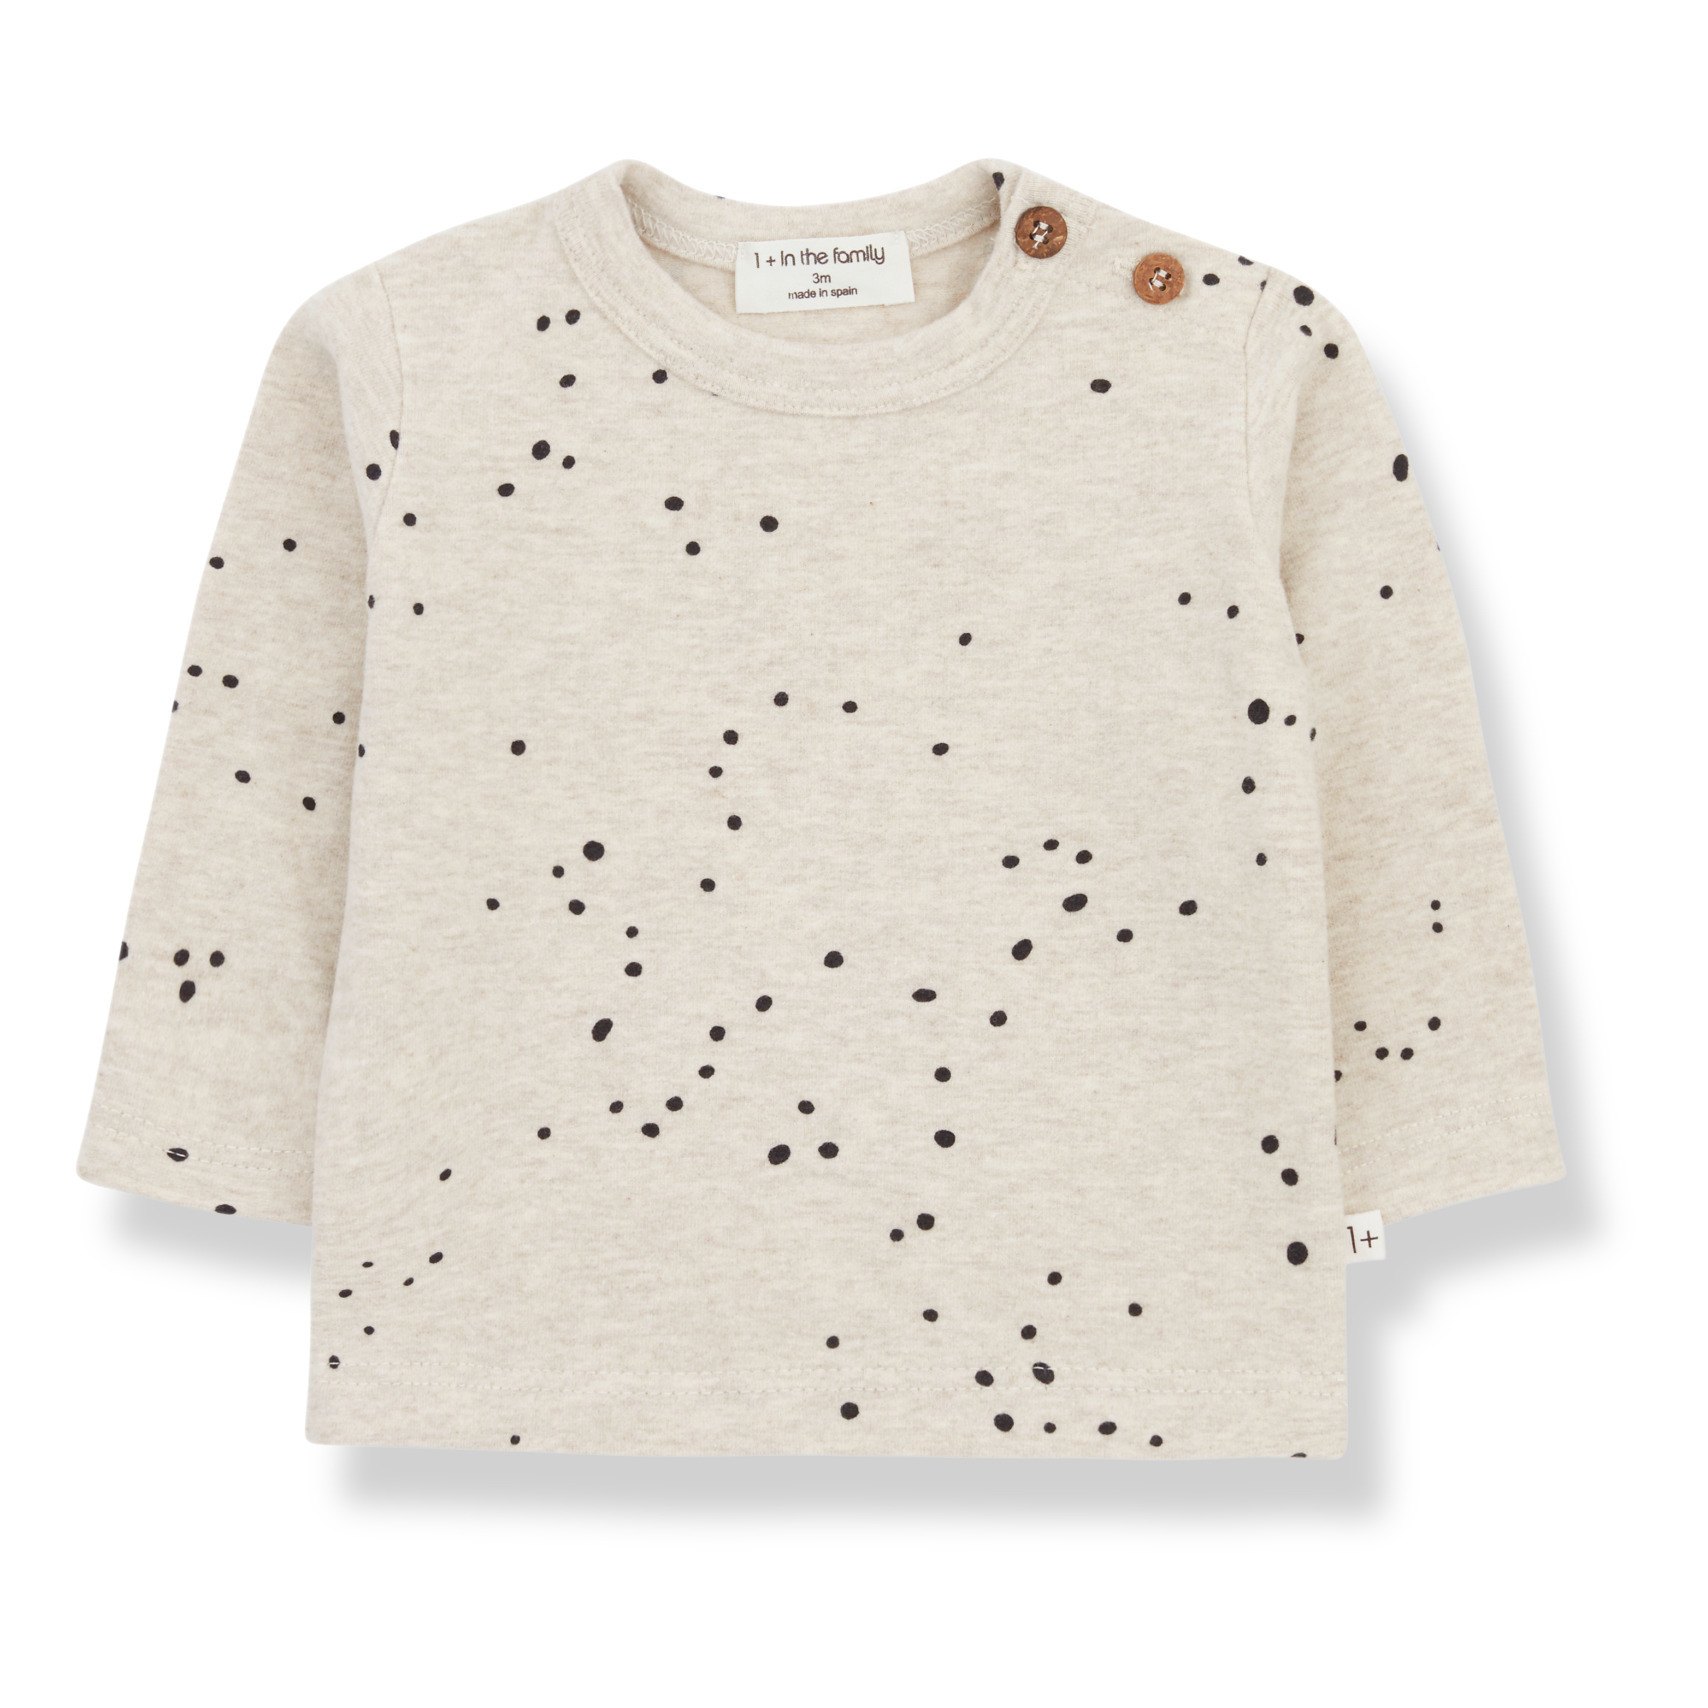 tee-shirt-mouchete-onemoreinthefamily